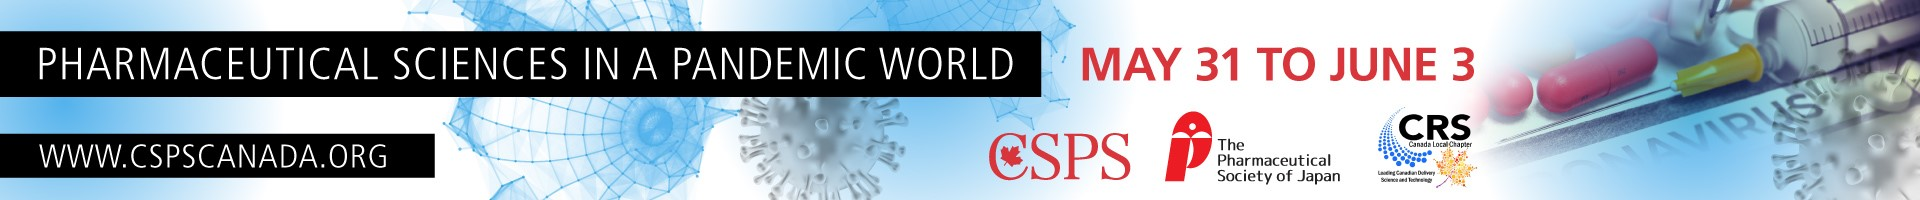 2021 CSPS/PSJ/CC-CRS Symposium Event Banner